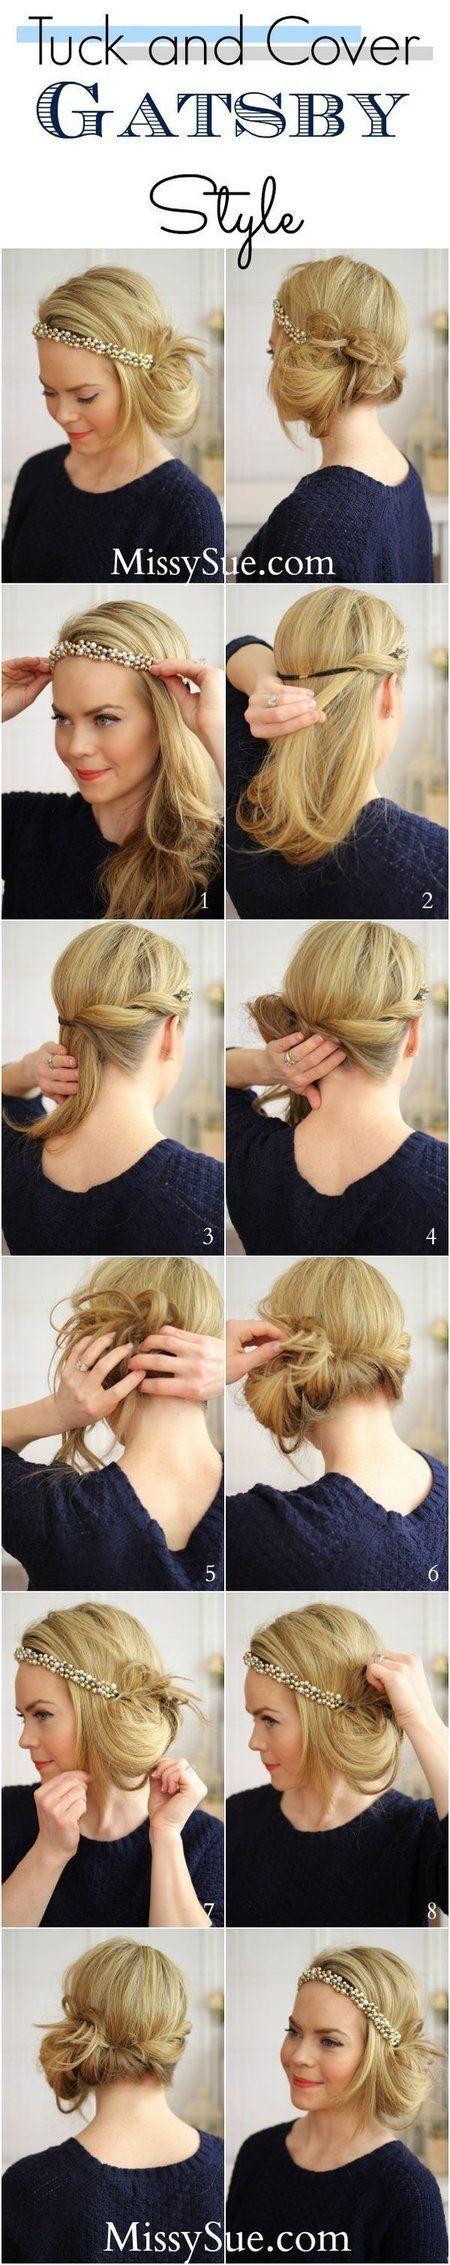 Pleasant 1000 Ideas About Flapper Hairstyles On Pinterest 1920S Makeup Short Hairstyles Gunalazisus